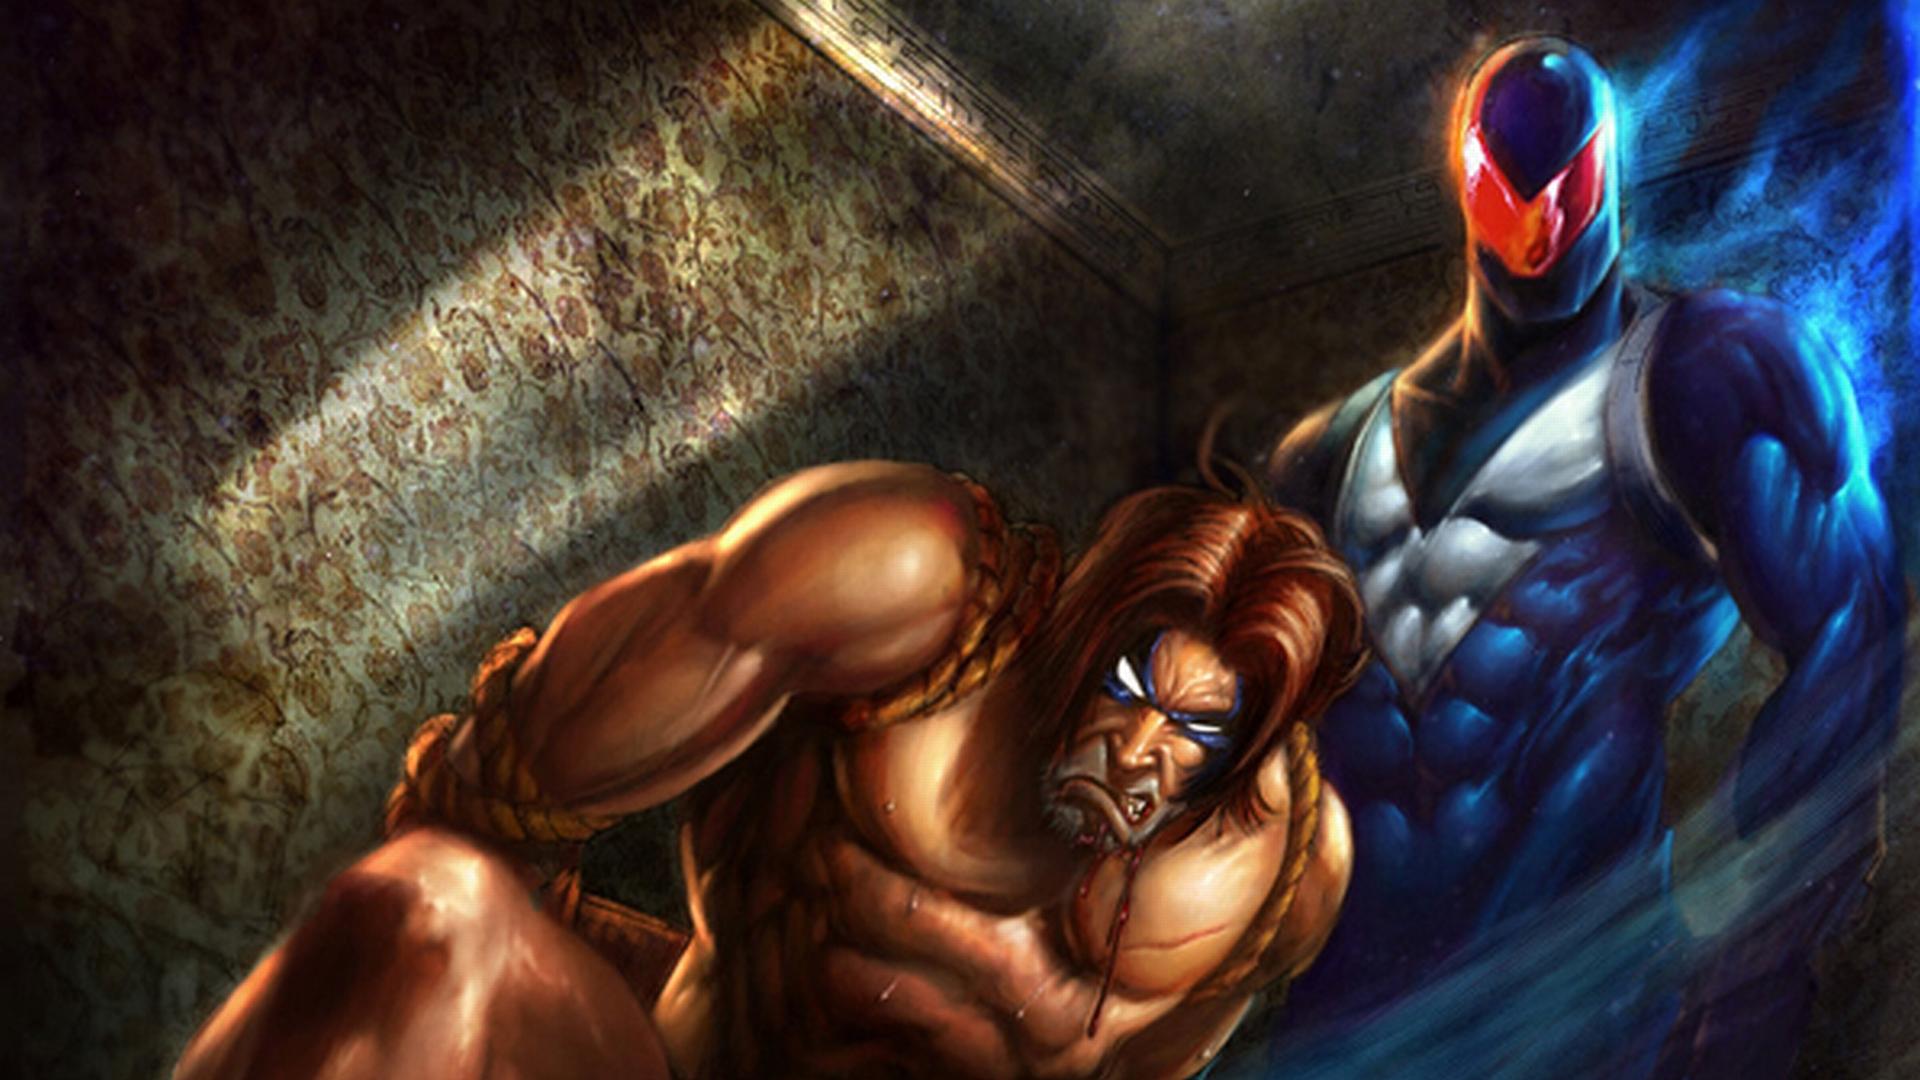 marvel super heroes iphone wallpaper